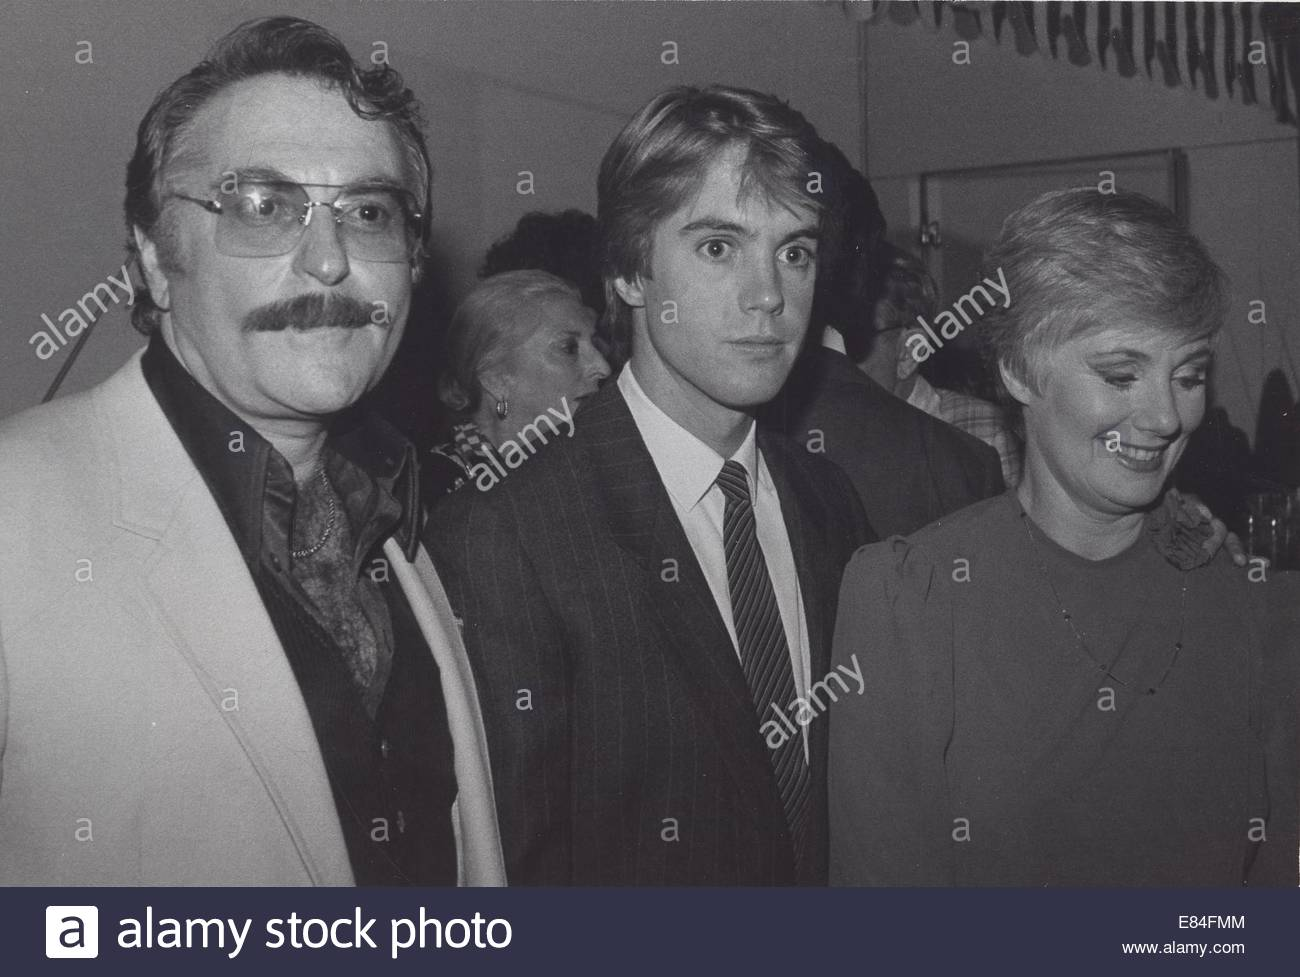 Marty Ingels husband